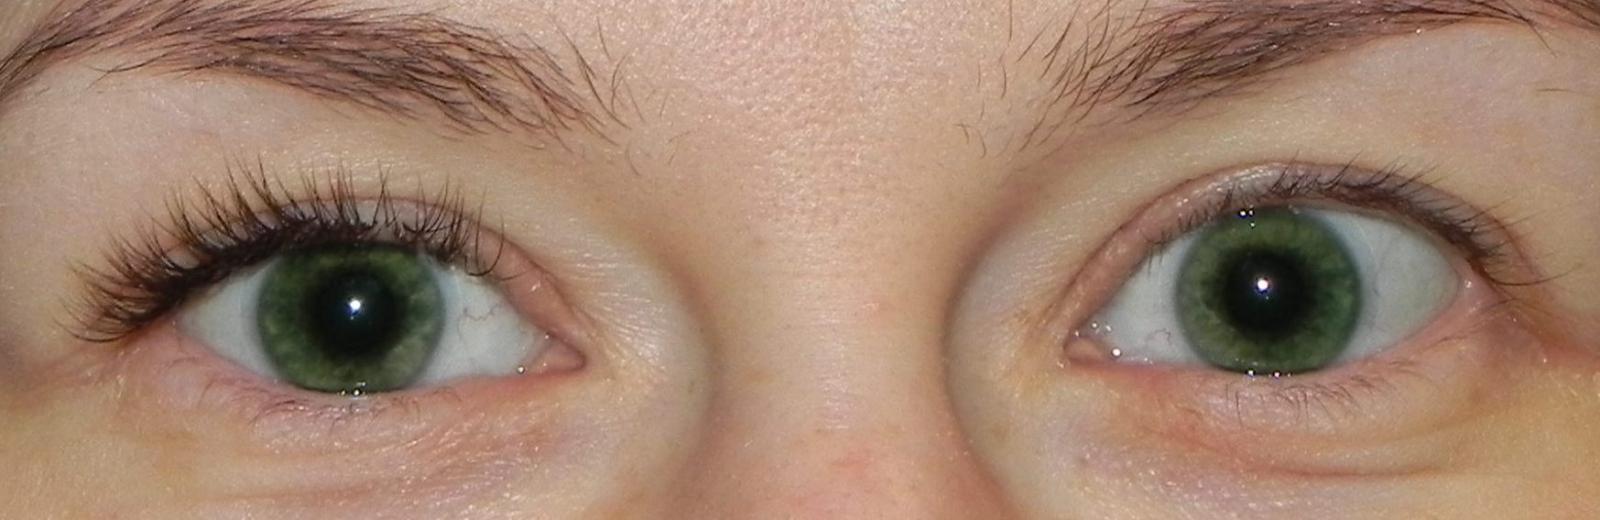 один глаз